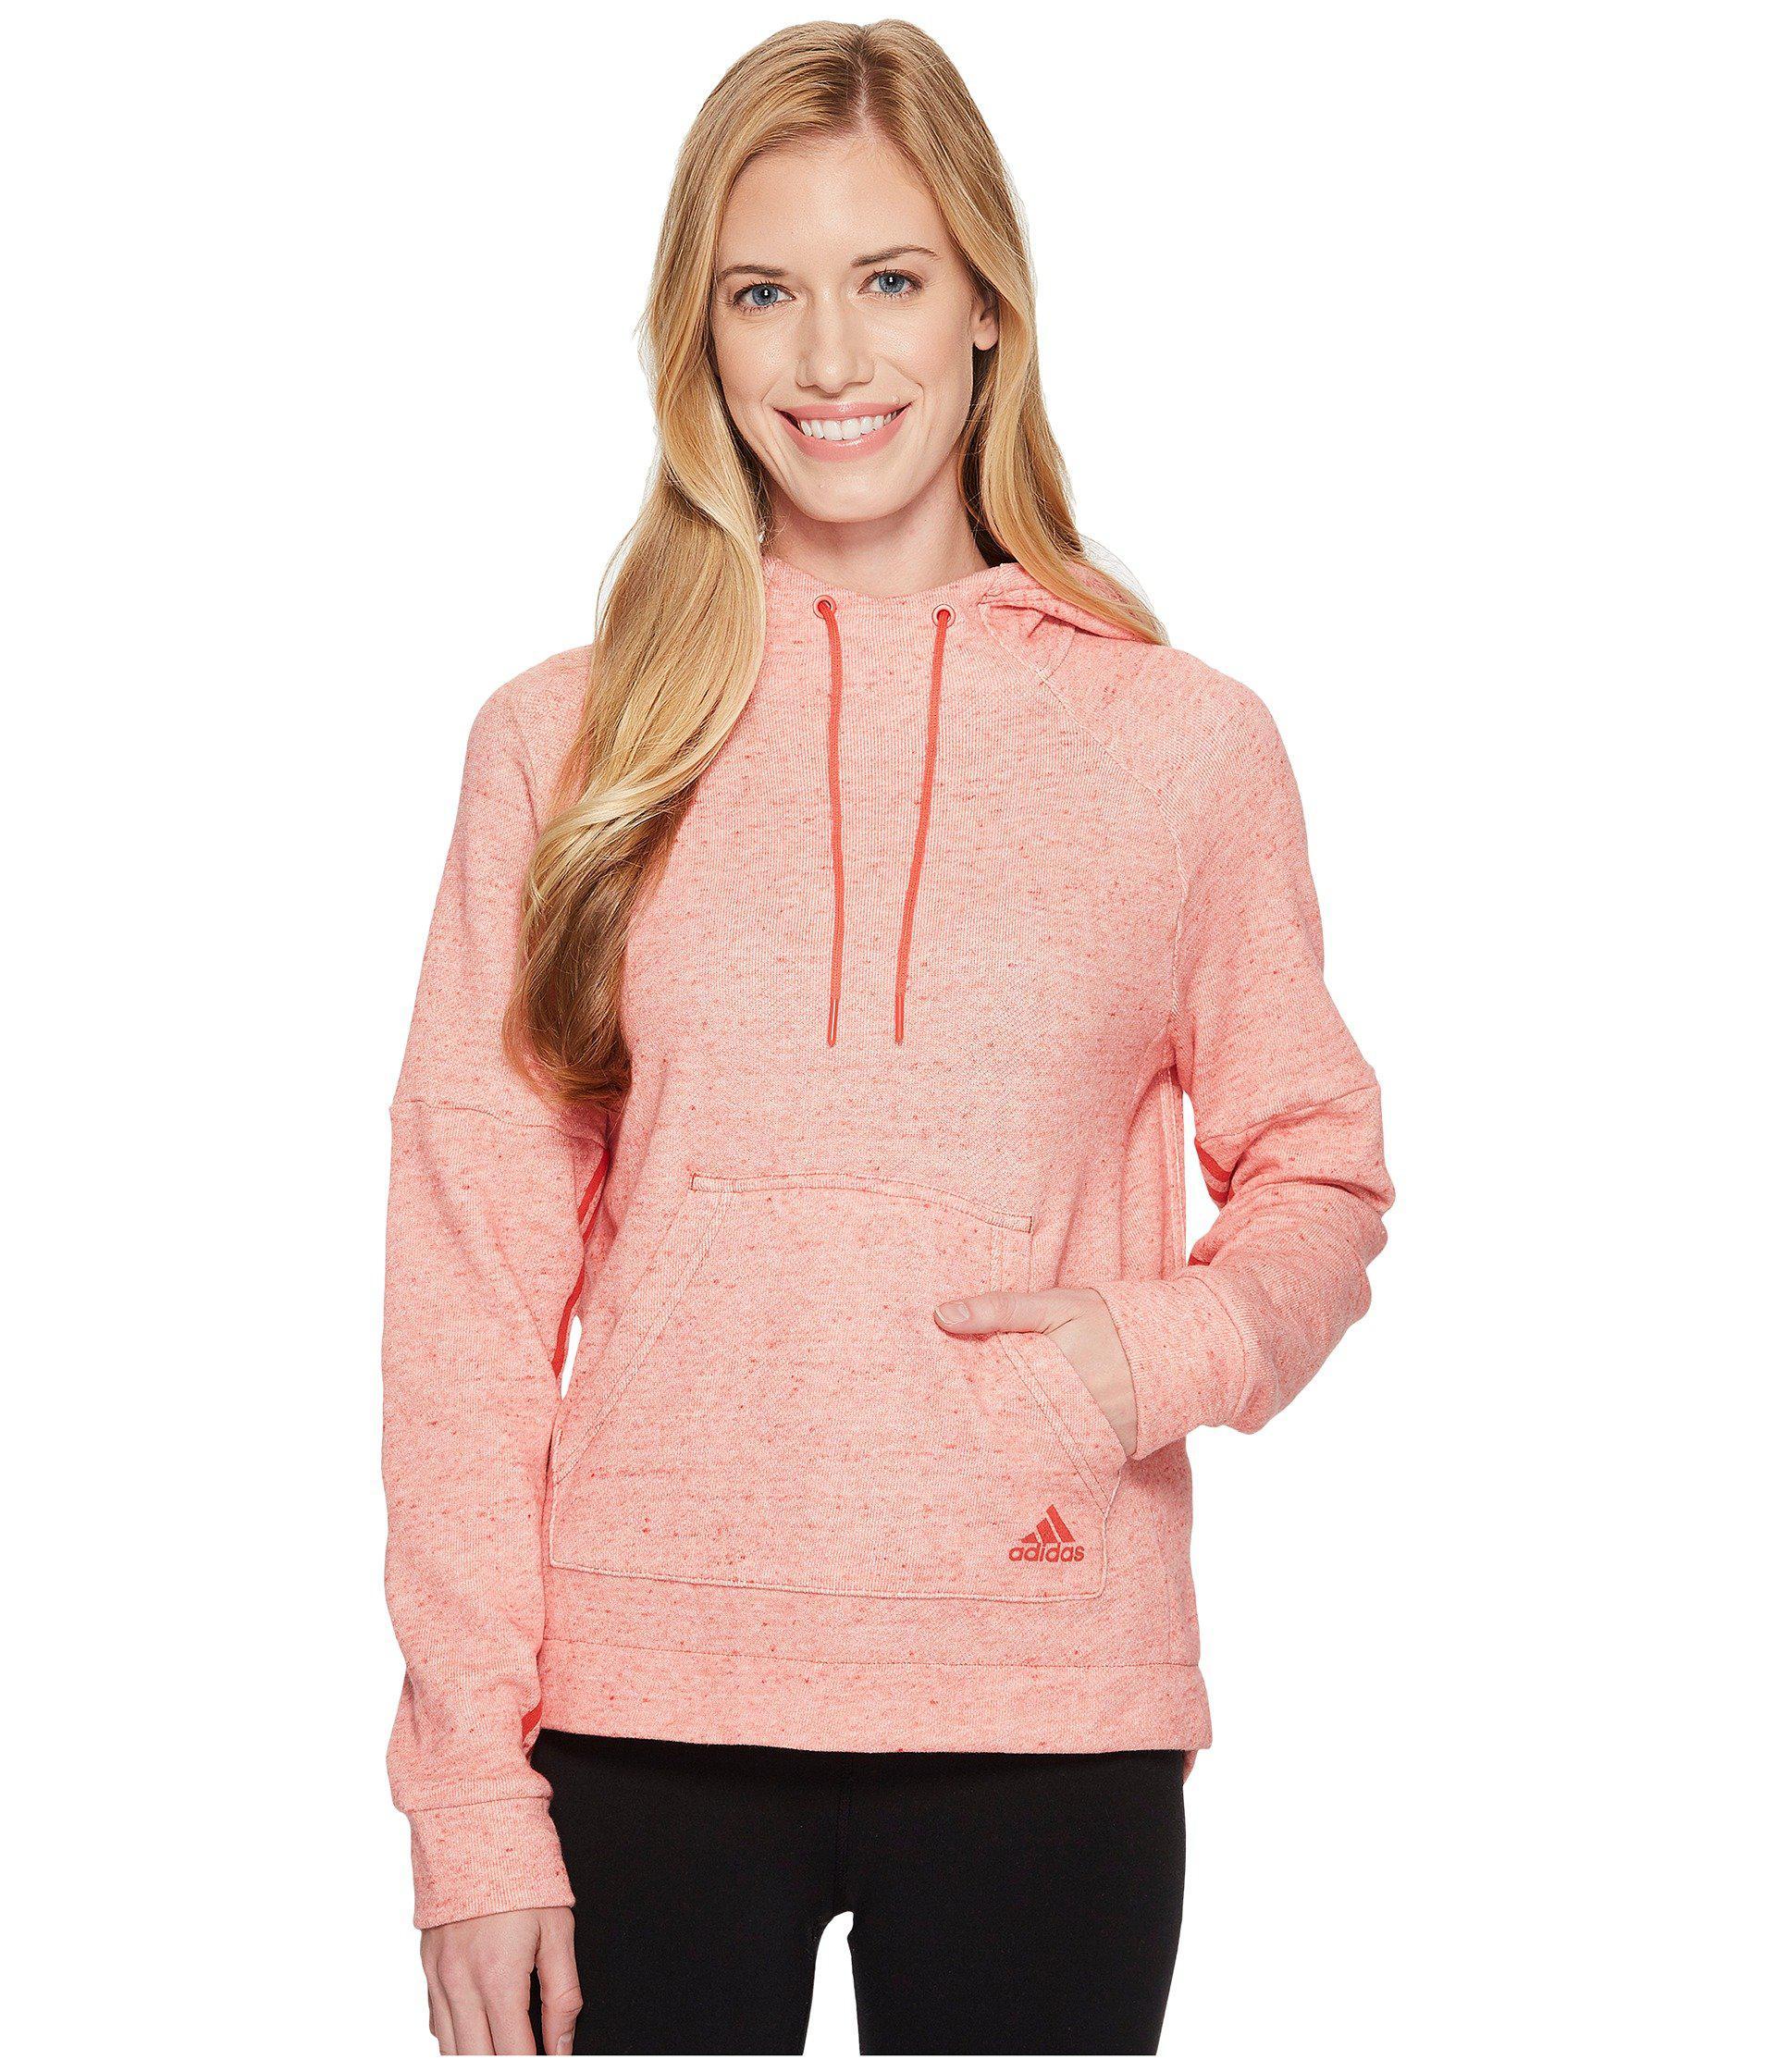 Lyst Rosa Adidas Sport2street Pullover Felpa Rosa Lyst 56820a